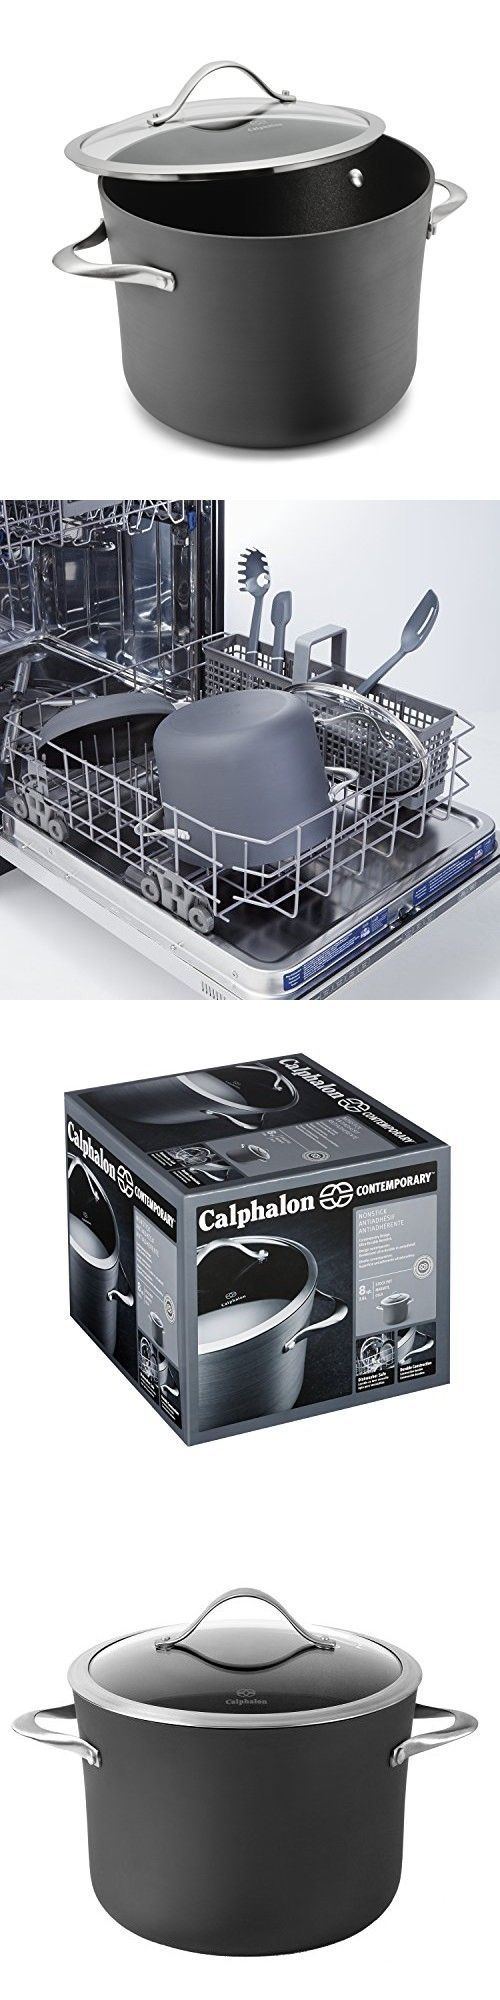 Calphalon Contemporary Hard-Anodized Aluminum Nonstick Cookware, Stock Pot, 8-quart, Black